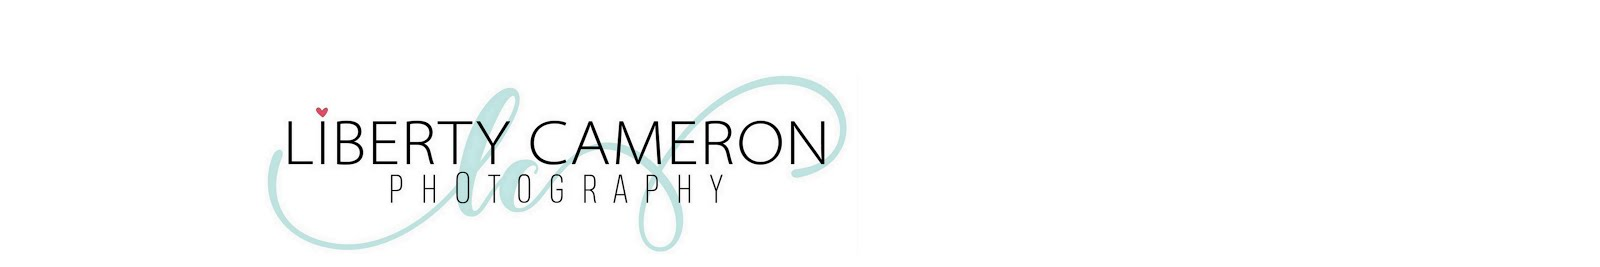 LIBERTY CAMERON PHOTOGRAPHY